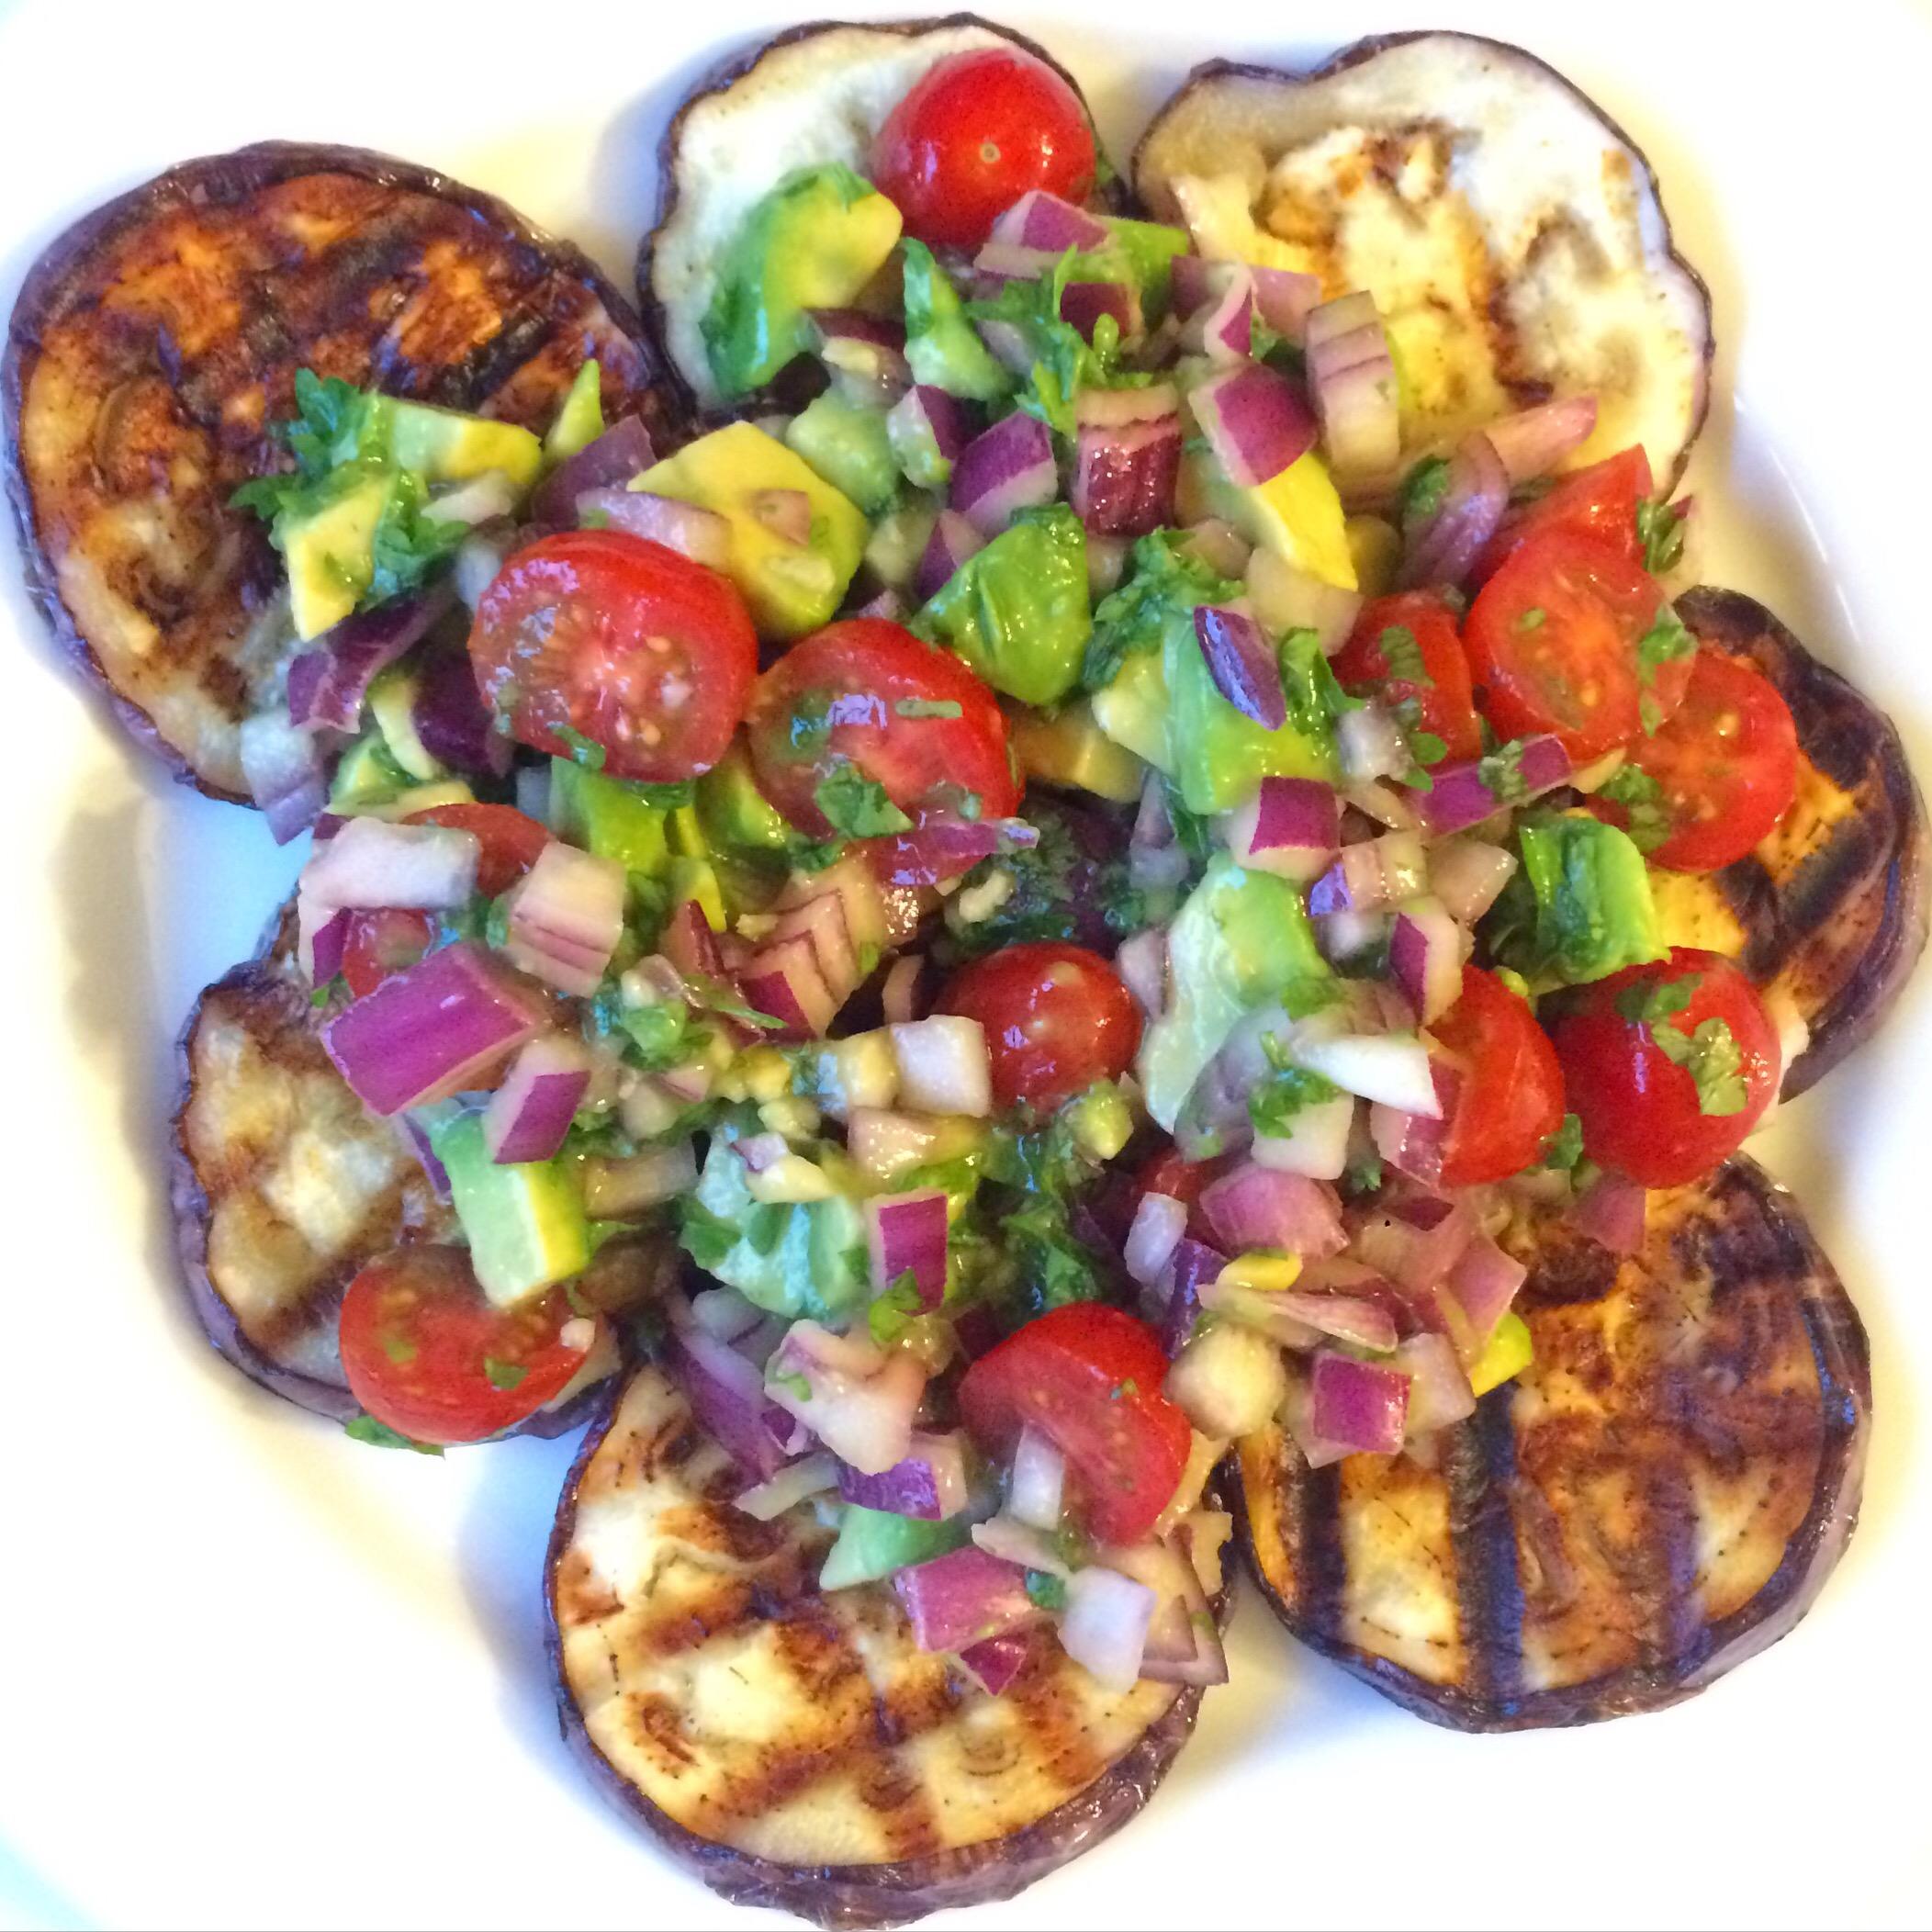 The 22 Day Revolution Vegan Diet Day Twenty – Food Fashion and